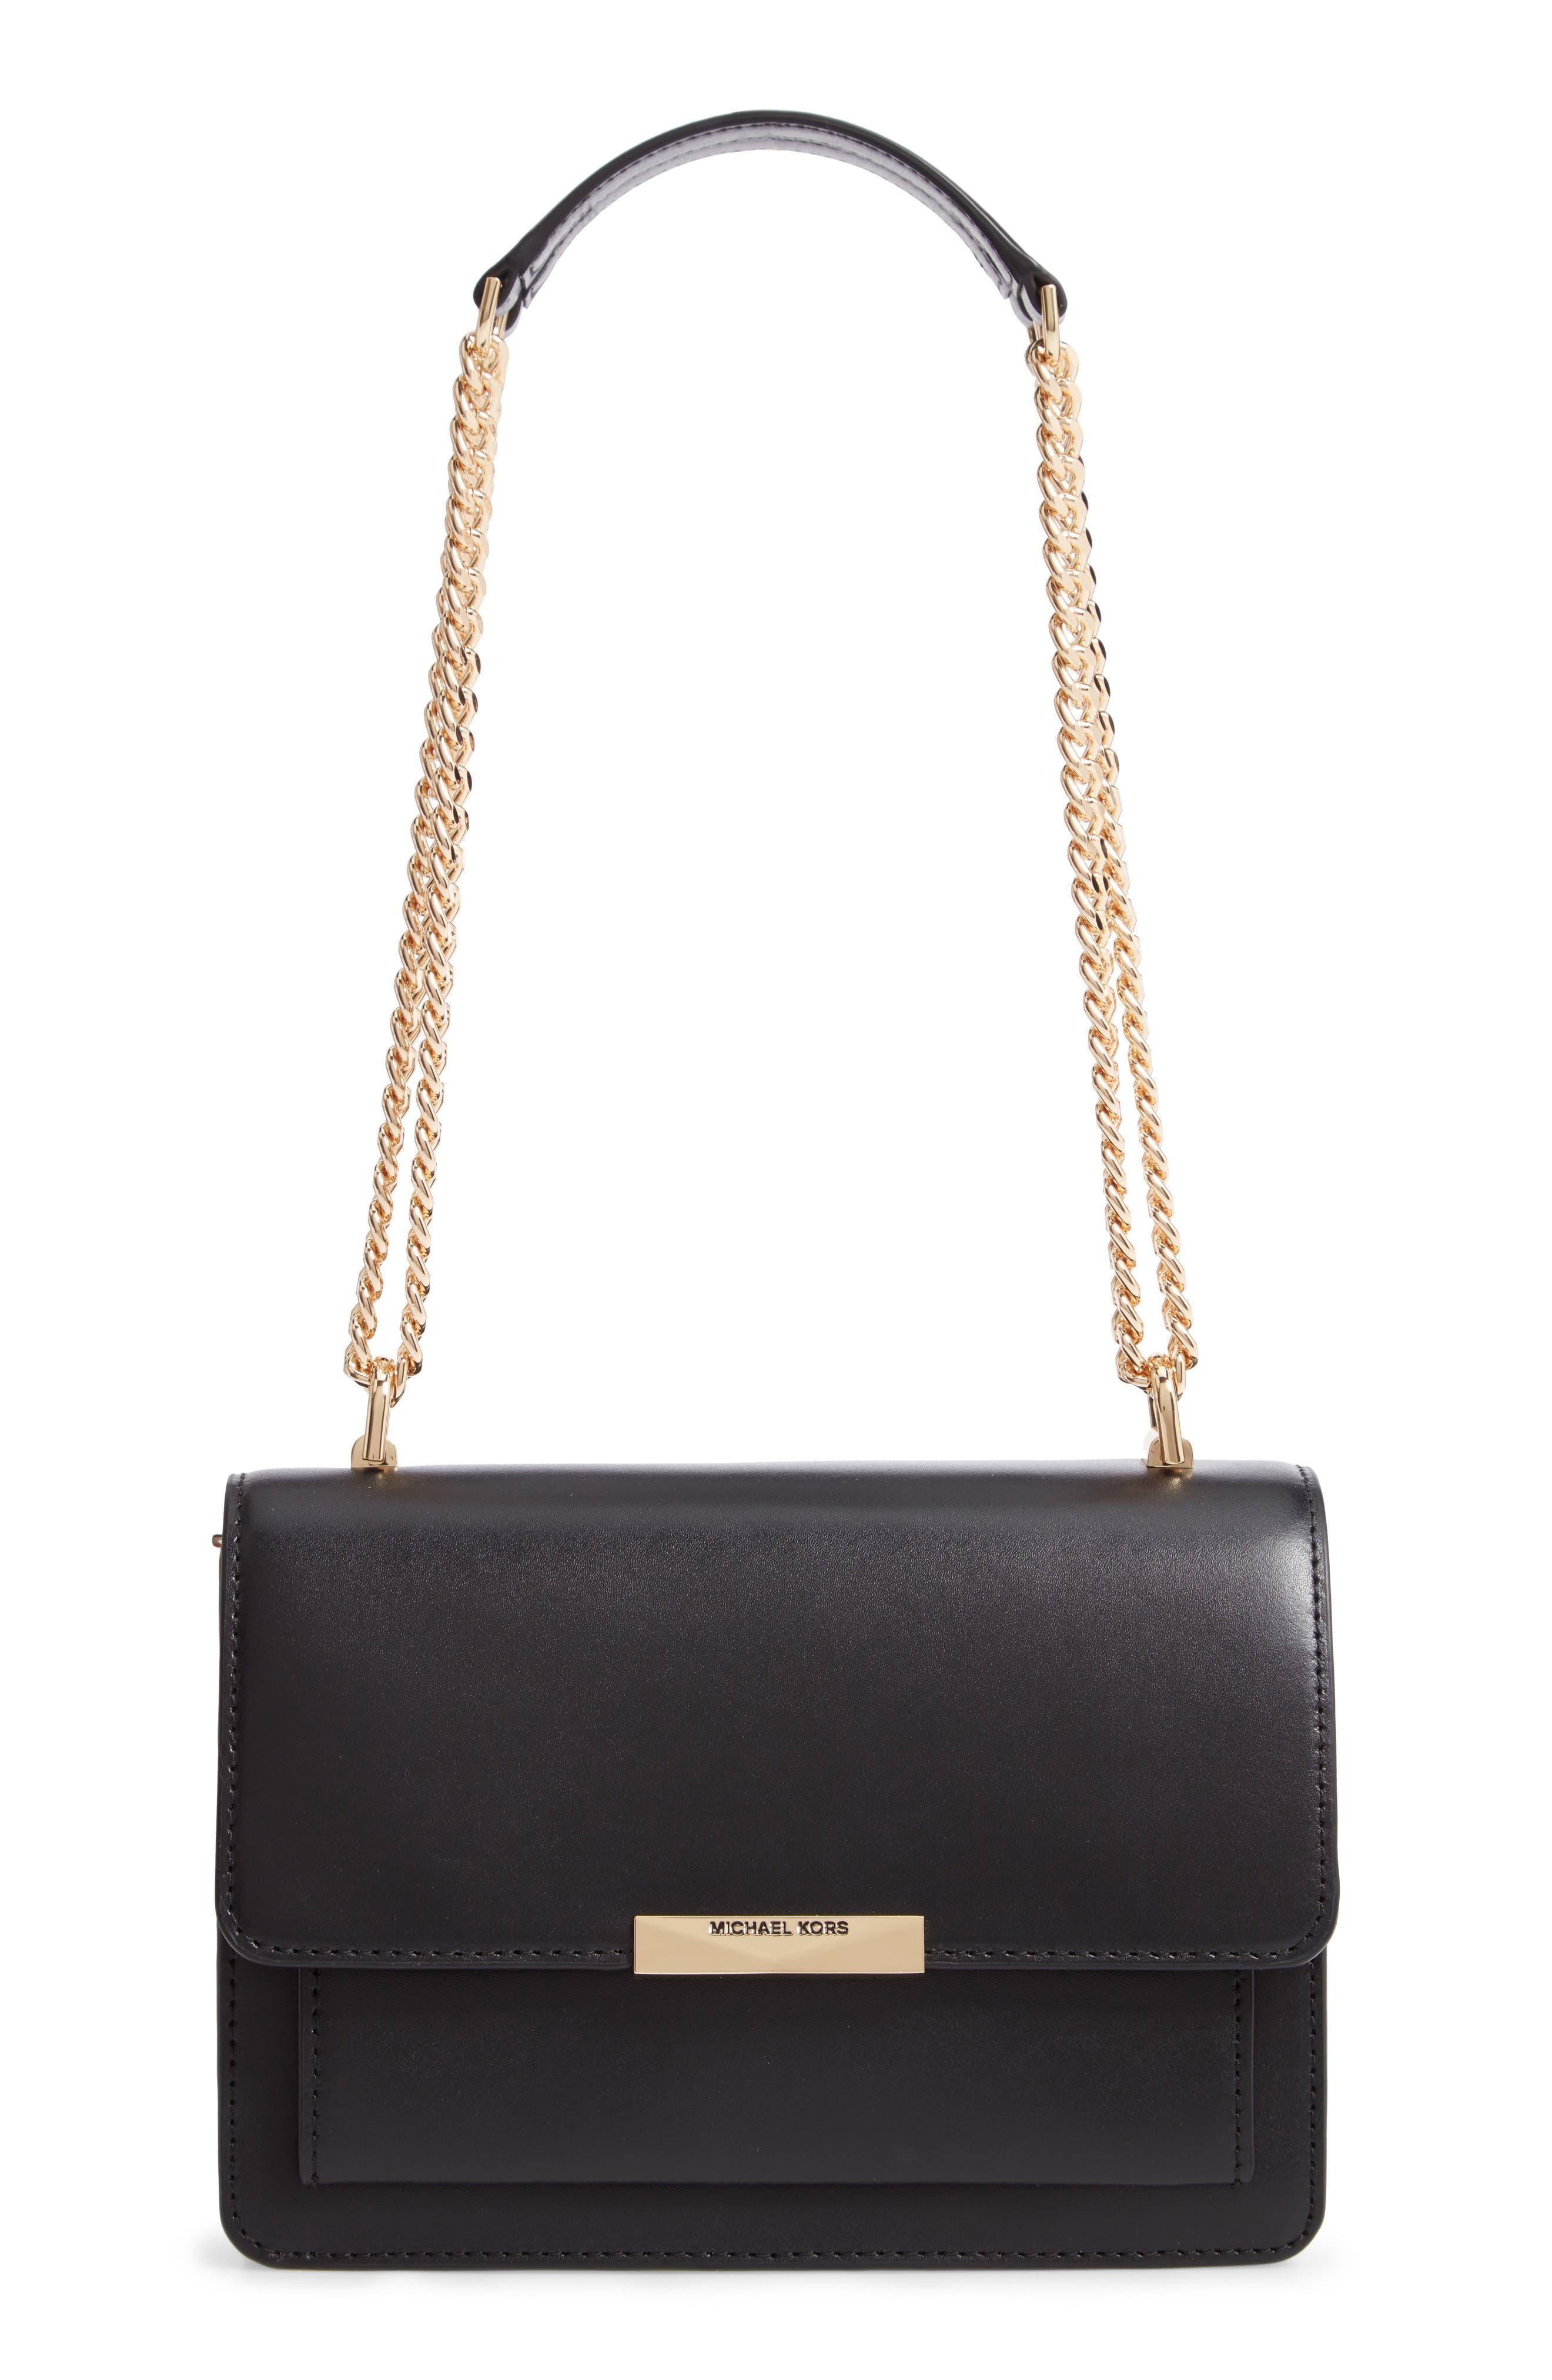 3de916724122 michael kors handbags | Nordstrom